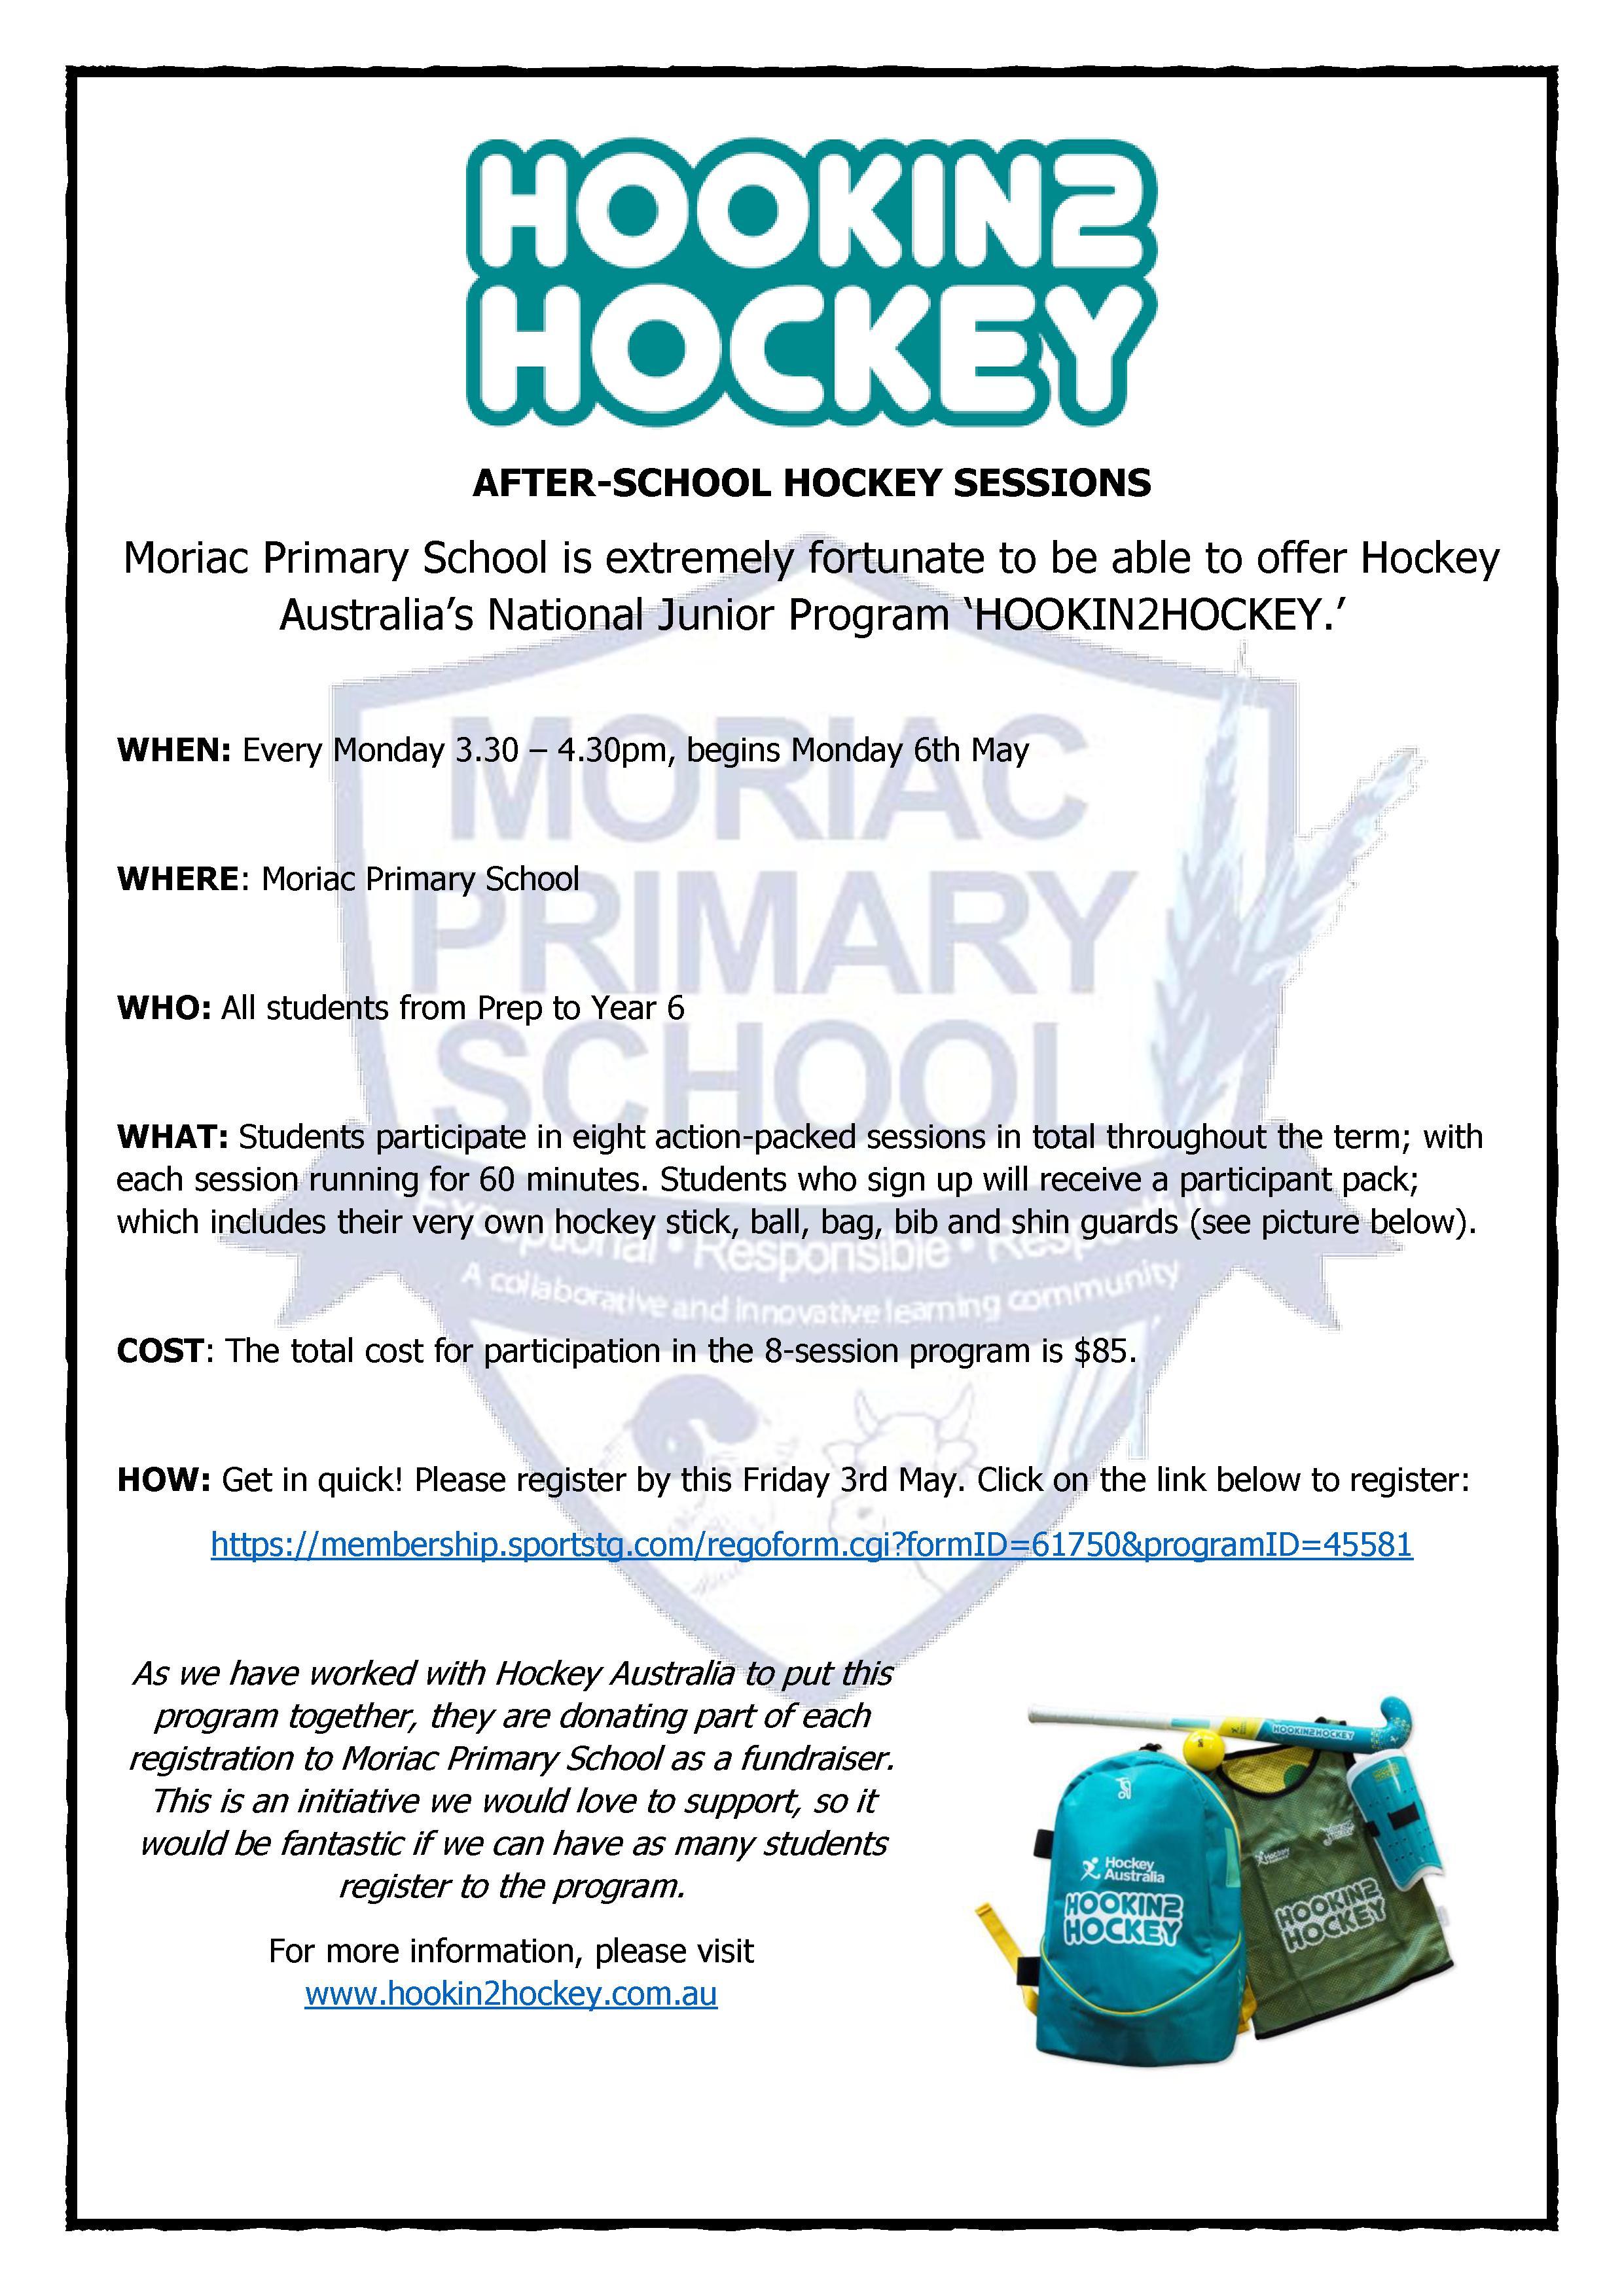 Hook In 2 Hockey.jpg